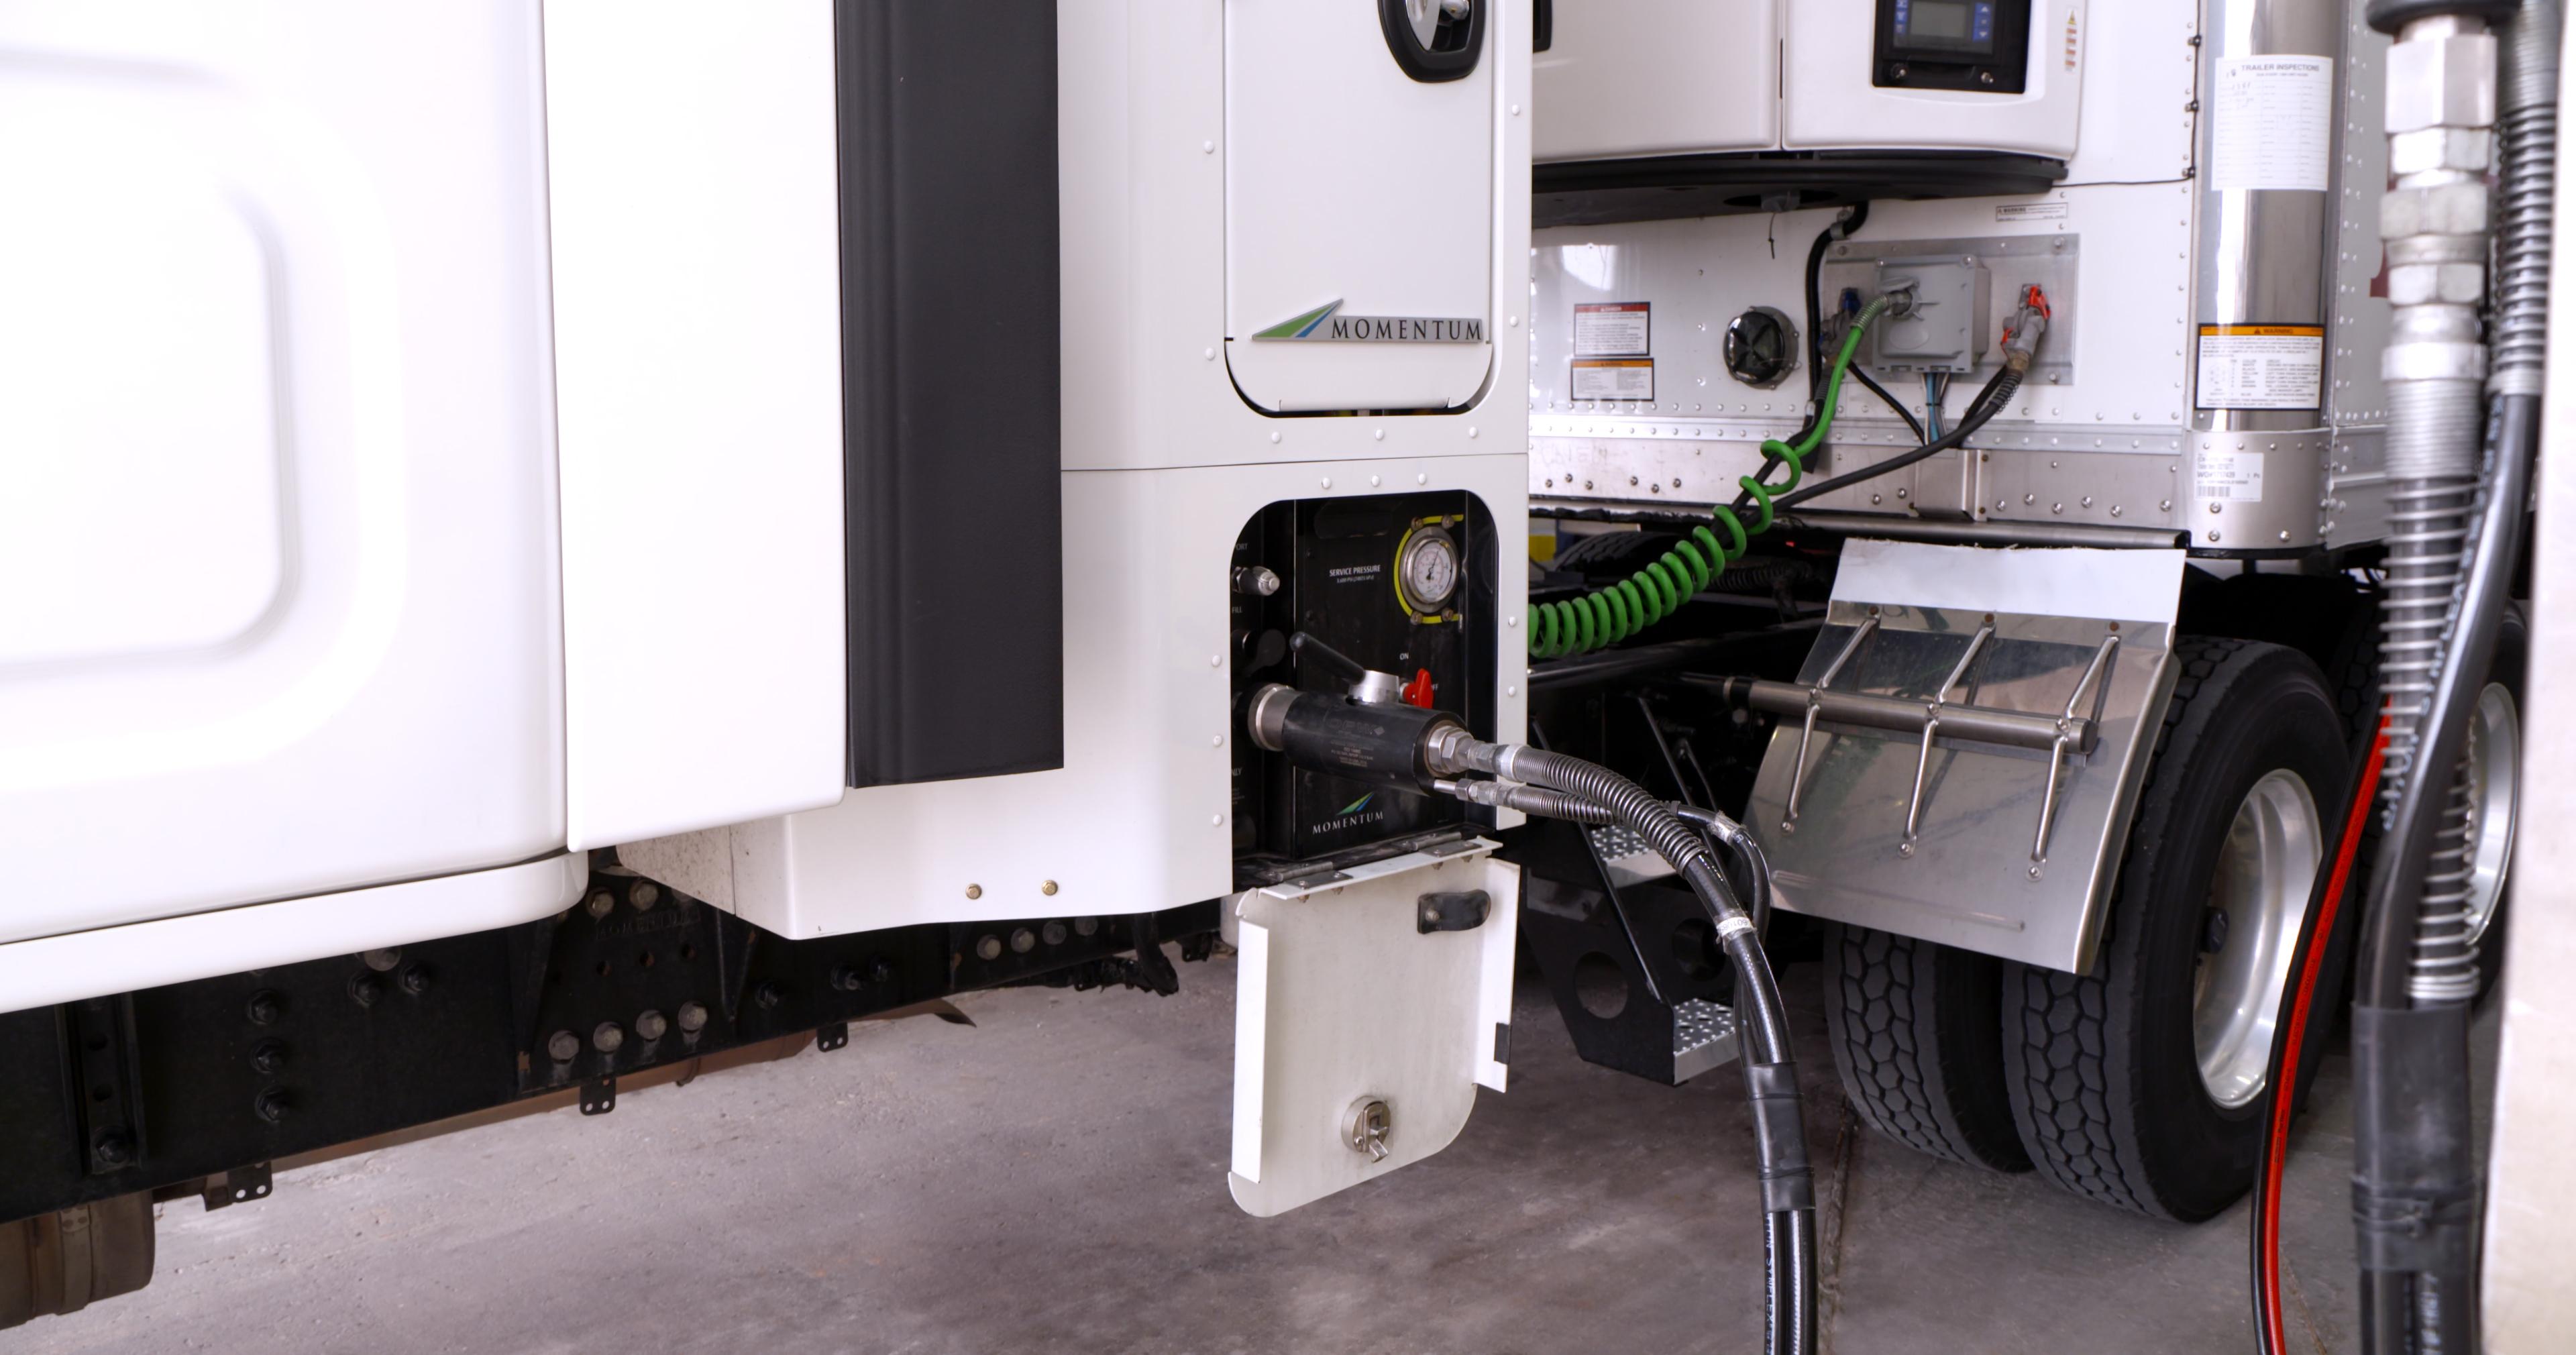 cng dispensing system